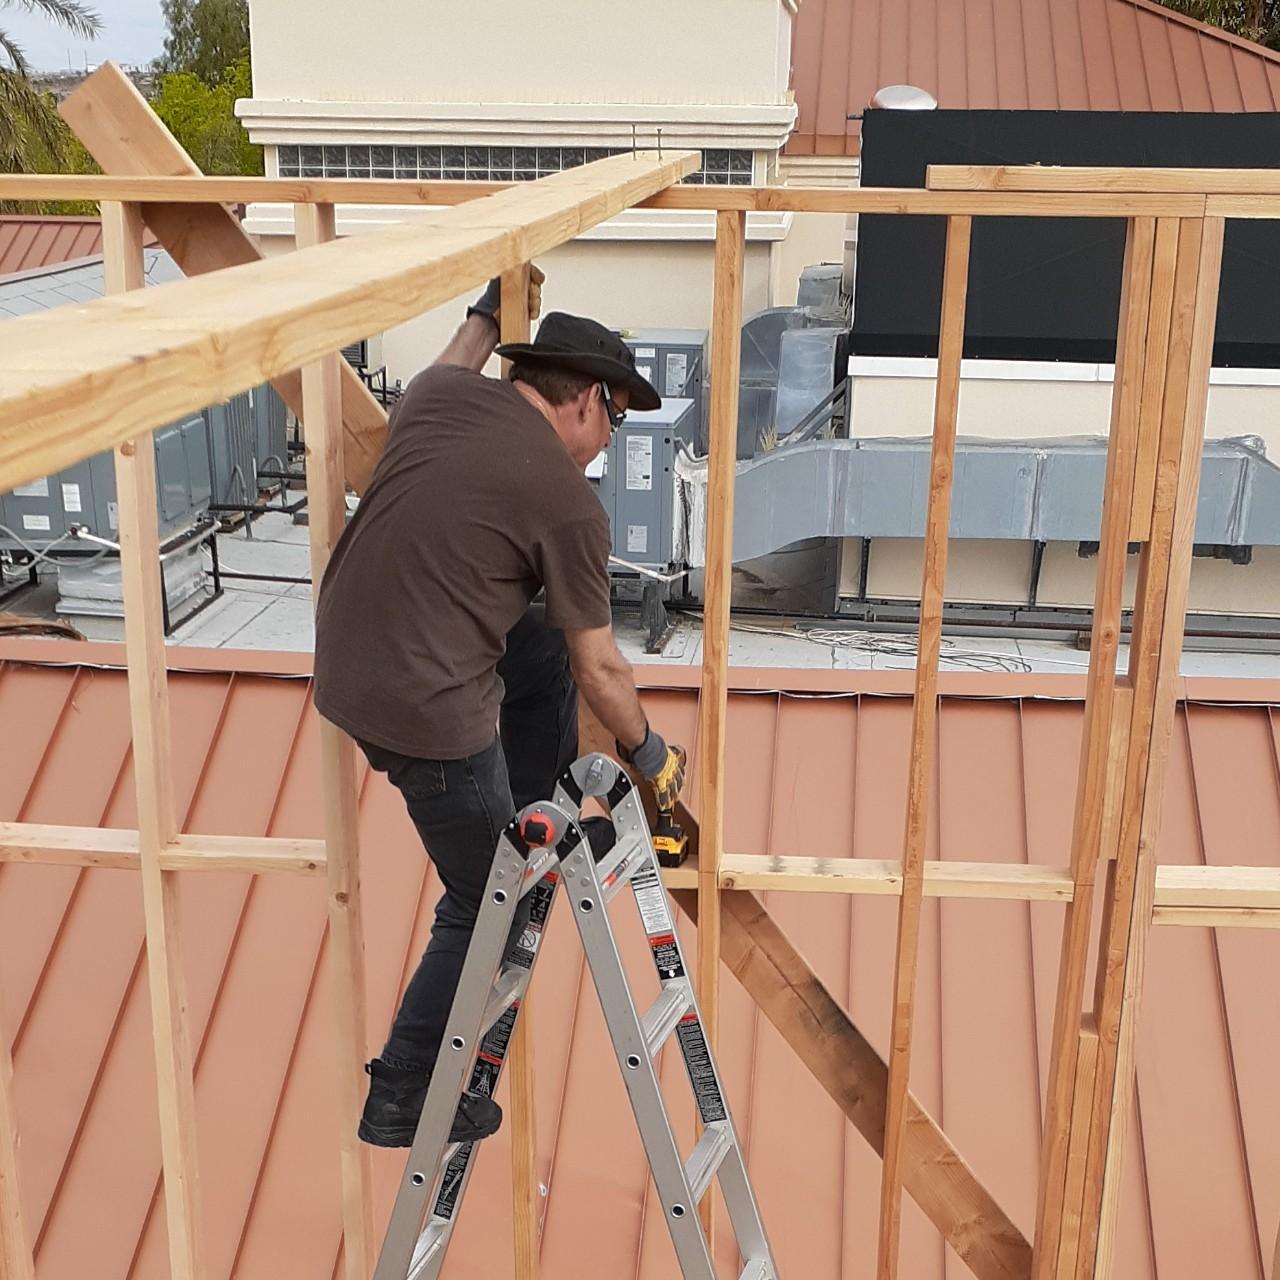 carpentry-wood-framing-second-floor-home-addition--framing-93